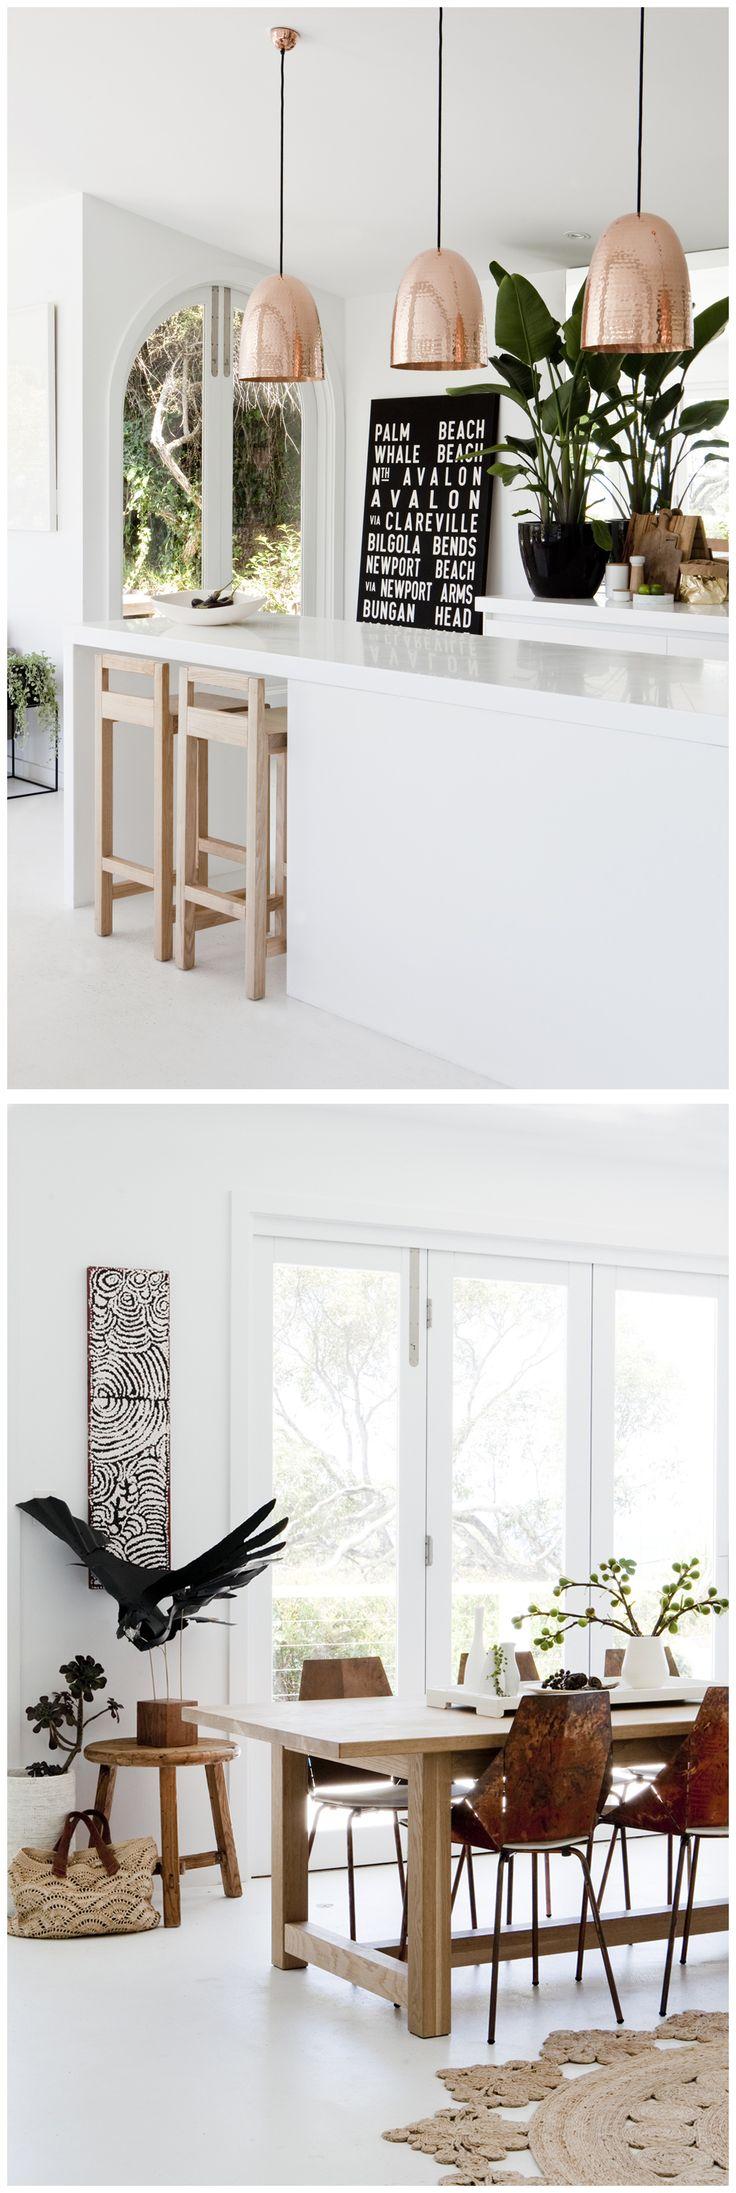 Copper Real Good Chairs // Marika Jarv Creative // Blu Dot Modern Furniture